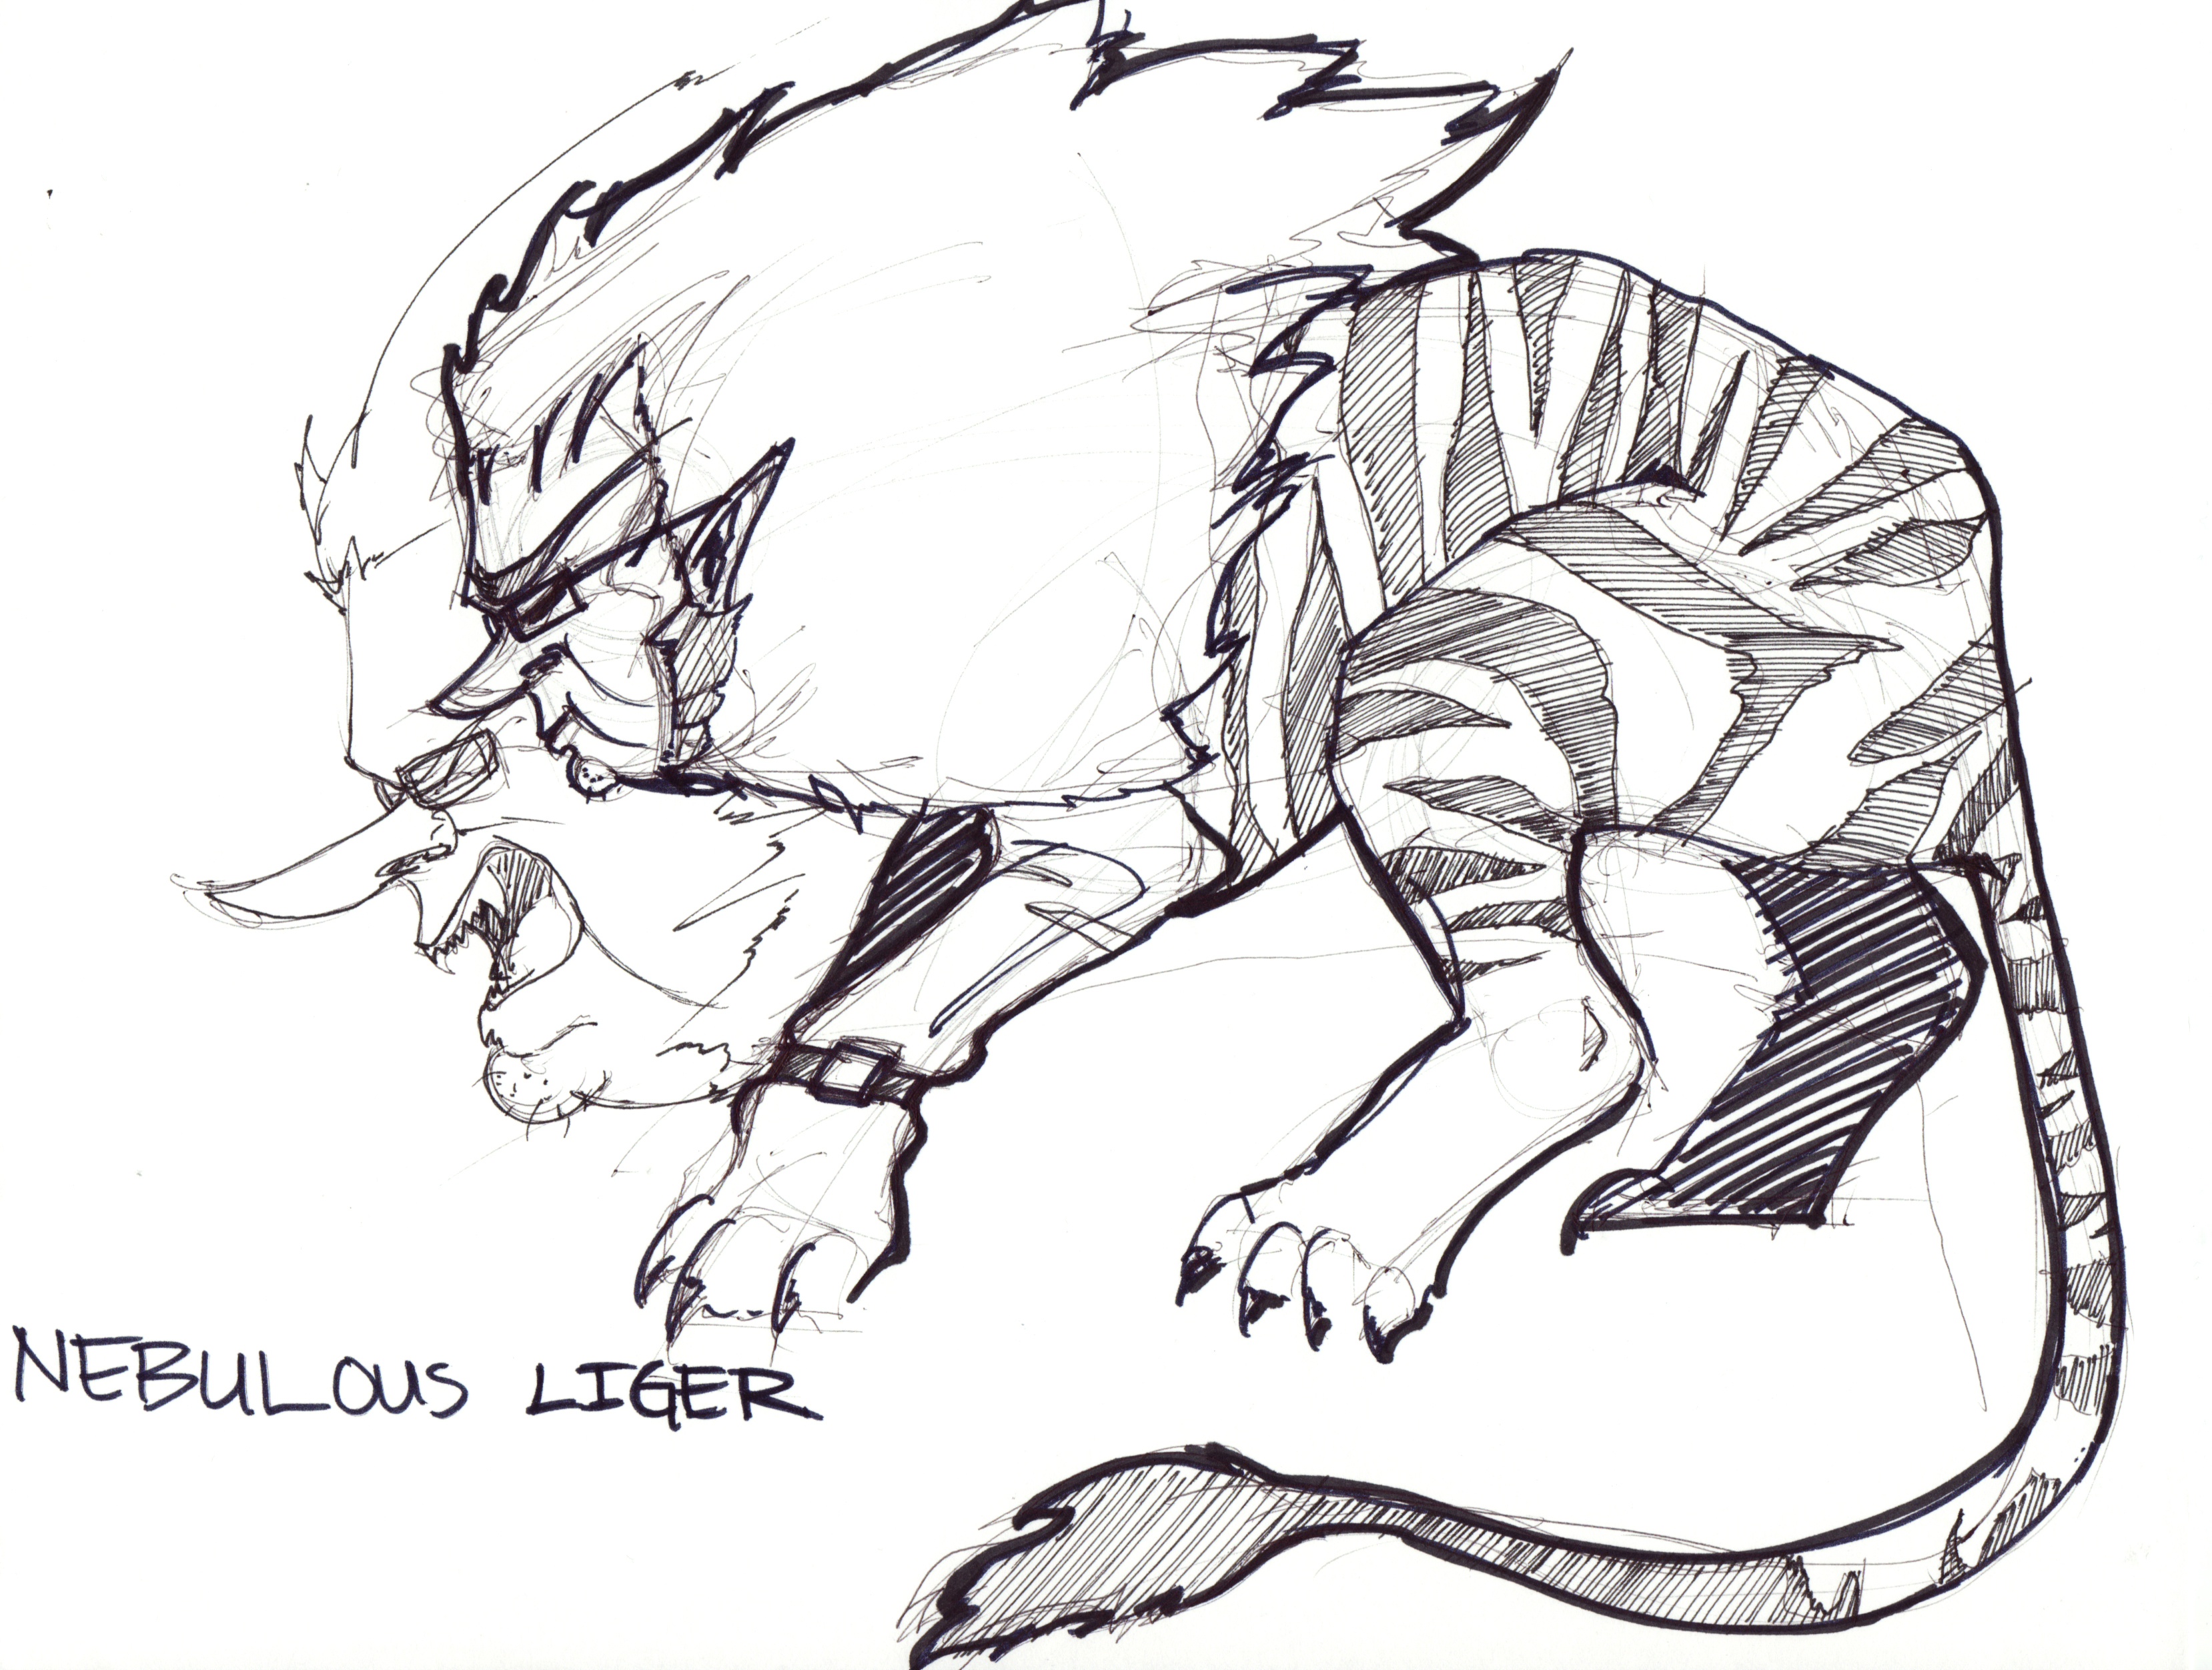 nebulous liger